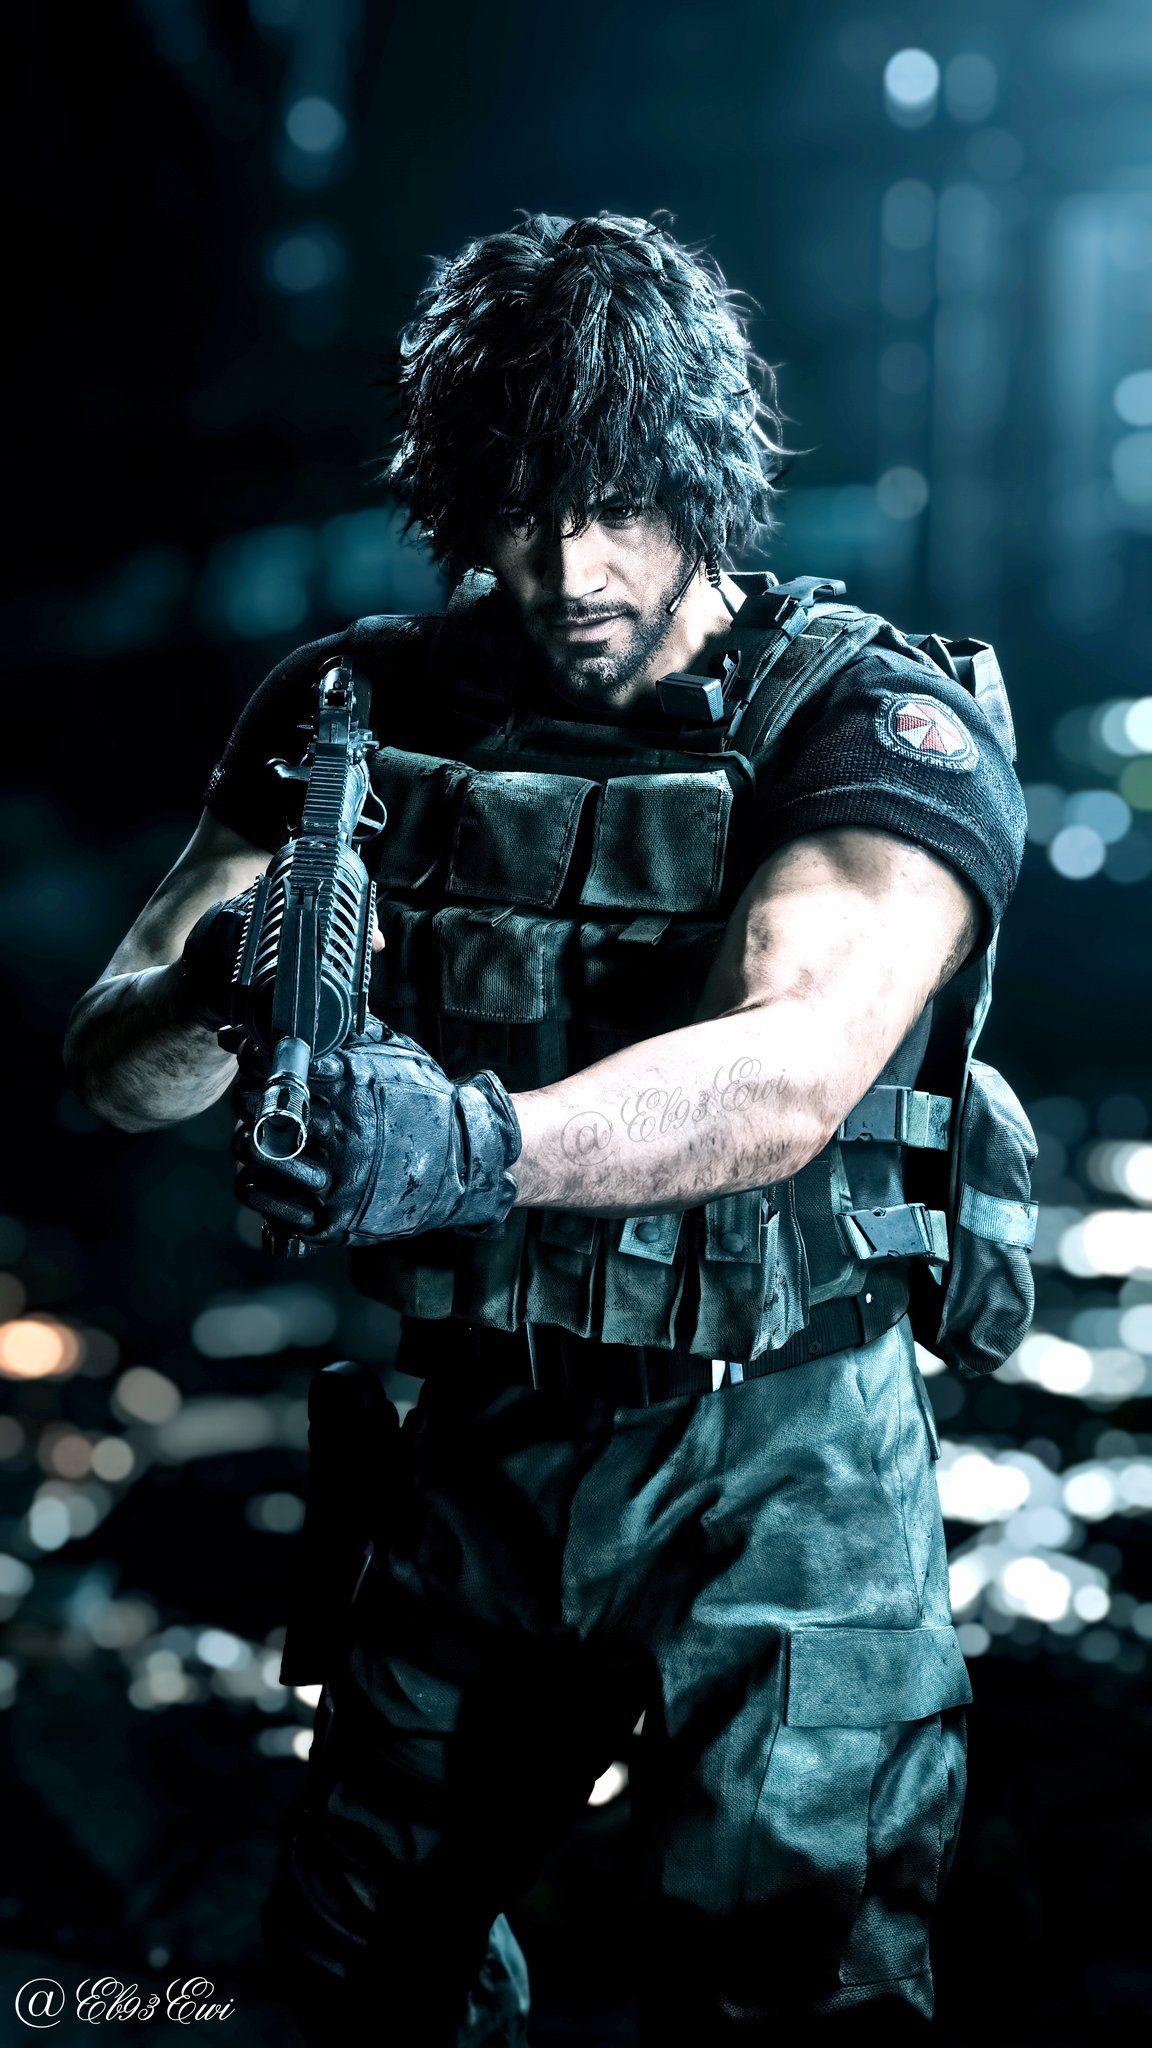 Get Some Resident Evil 3 Remake Wallpaper Hd Image Vozeli Com